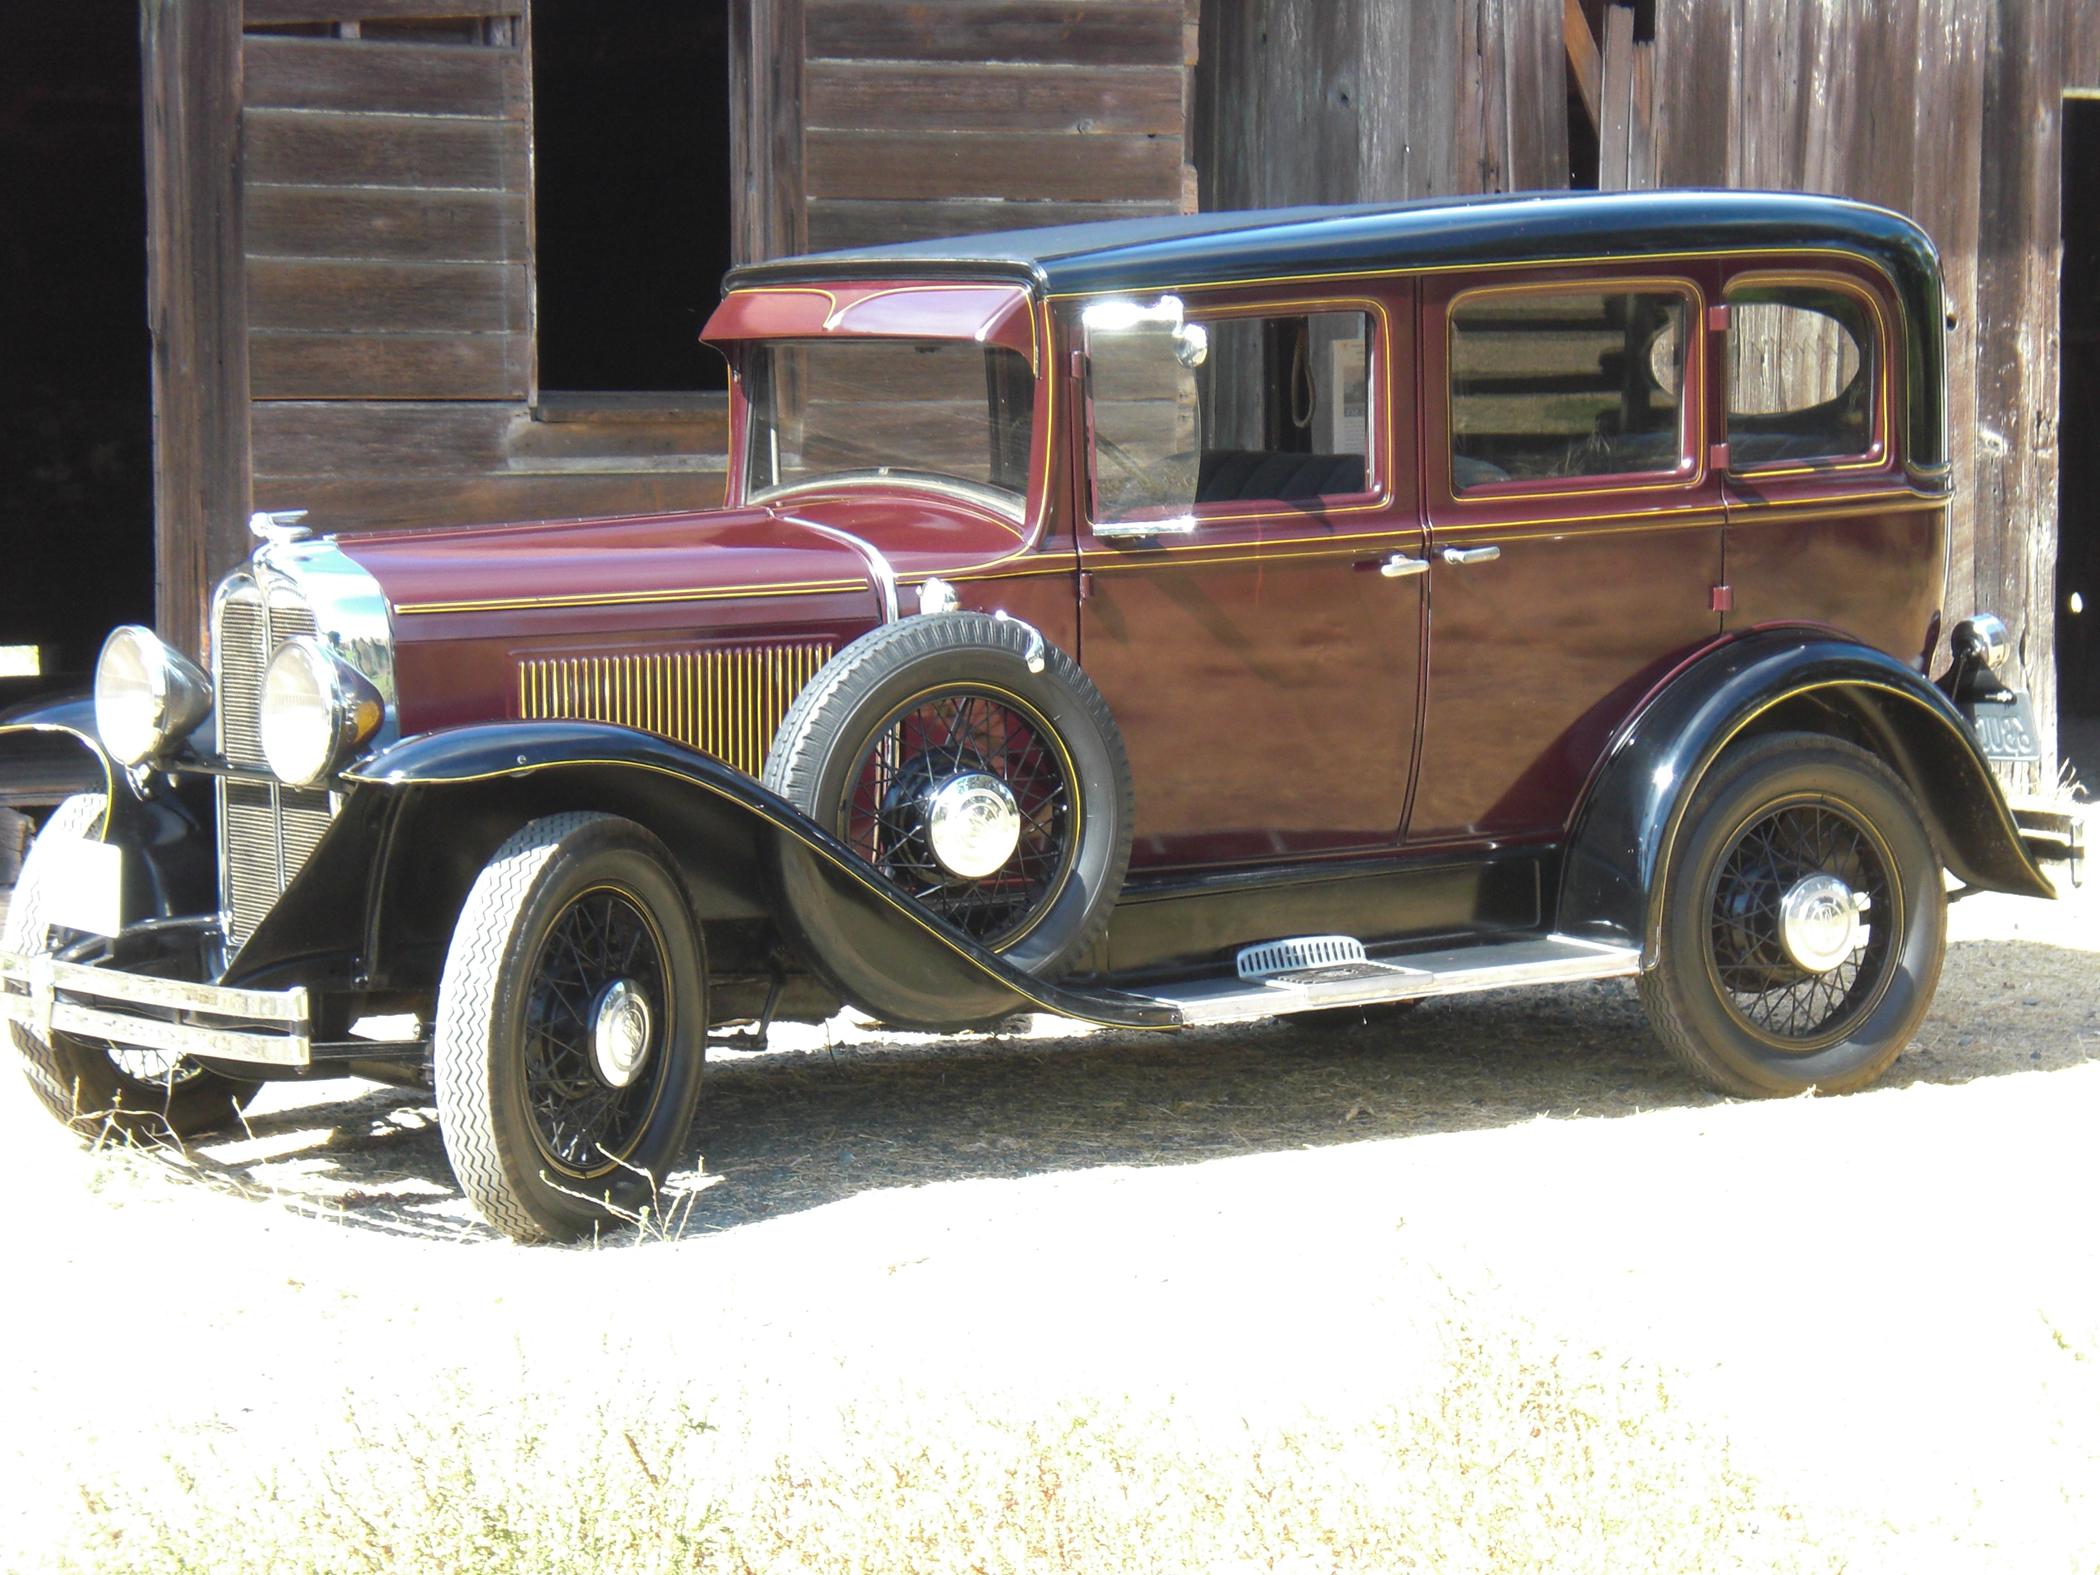 1930 Pontiac Deluxe 1930 Pontiac Deluxe Askautoexperts Com